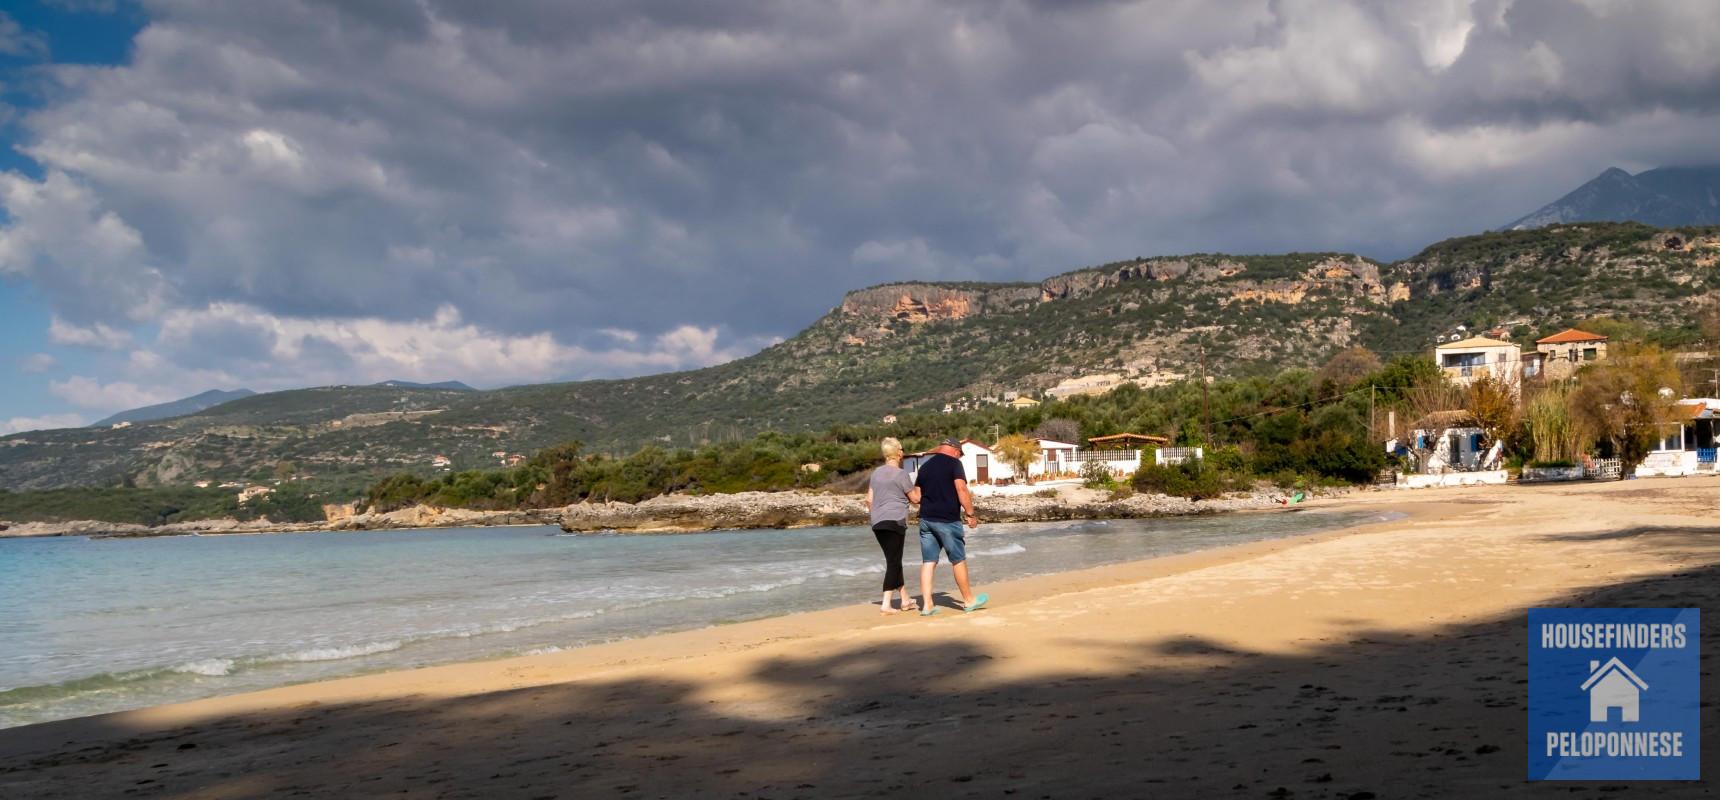 Housefinders Peloponnese hyra boende långtid Peloponnesos Grekland Kalamata Nafplio